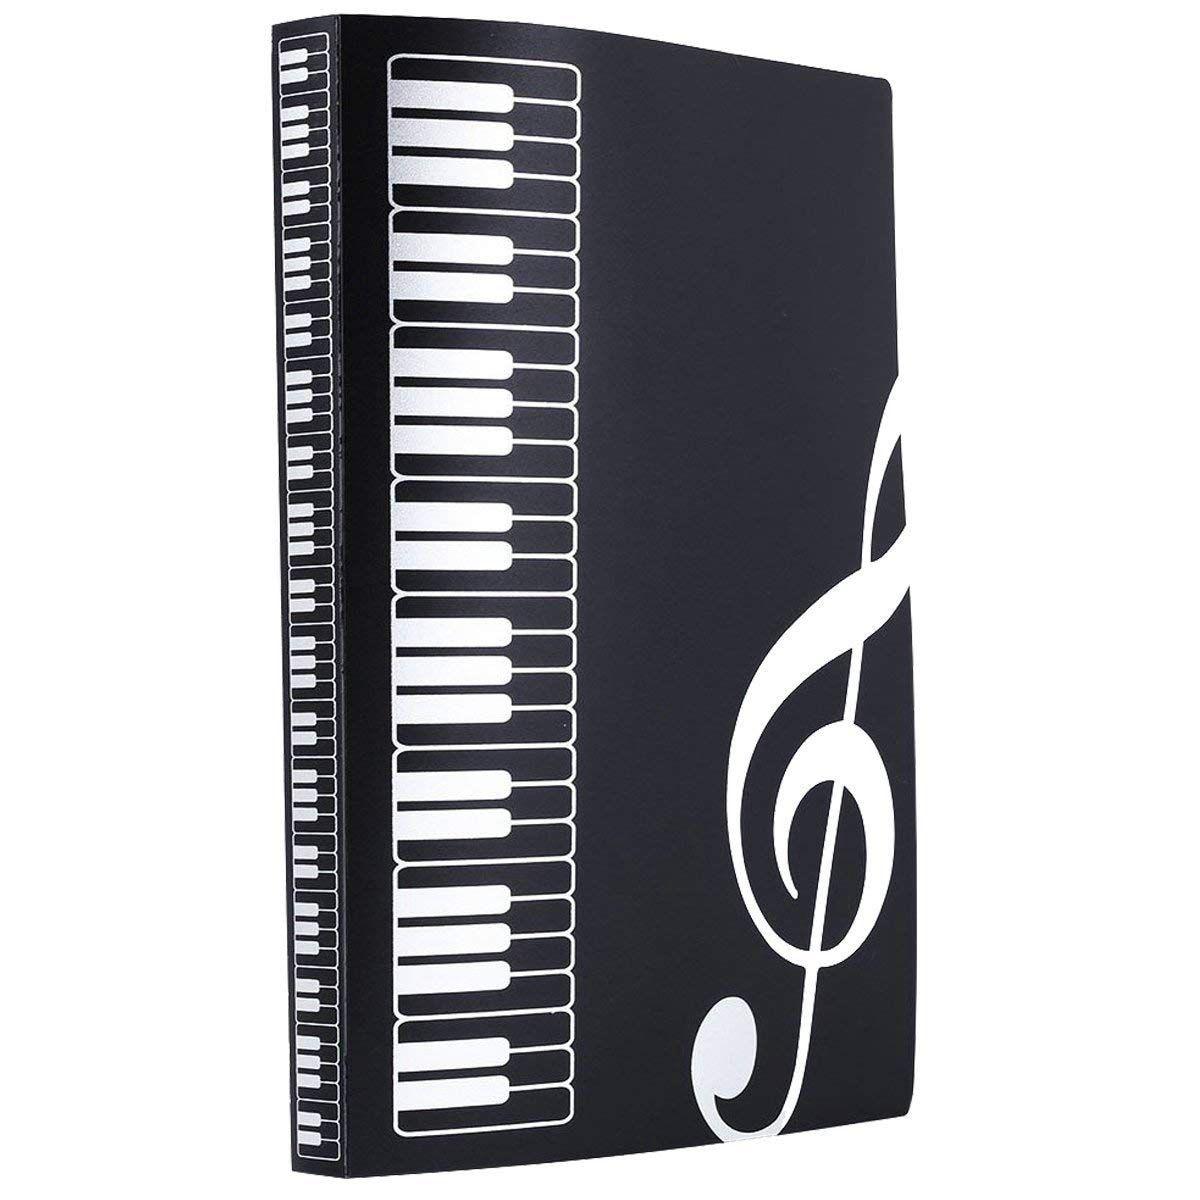 Music Sheet File Paper Documents Storage Folder Holder PVC.A4 Size,40 Pockets (Black)